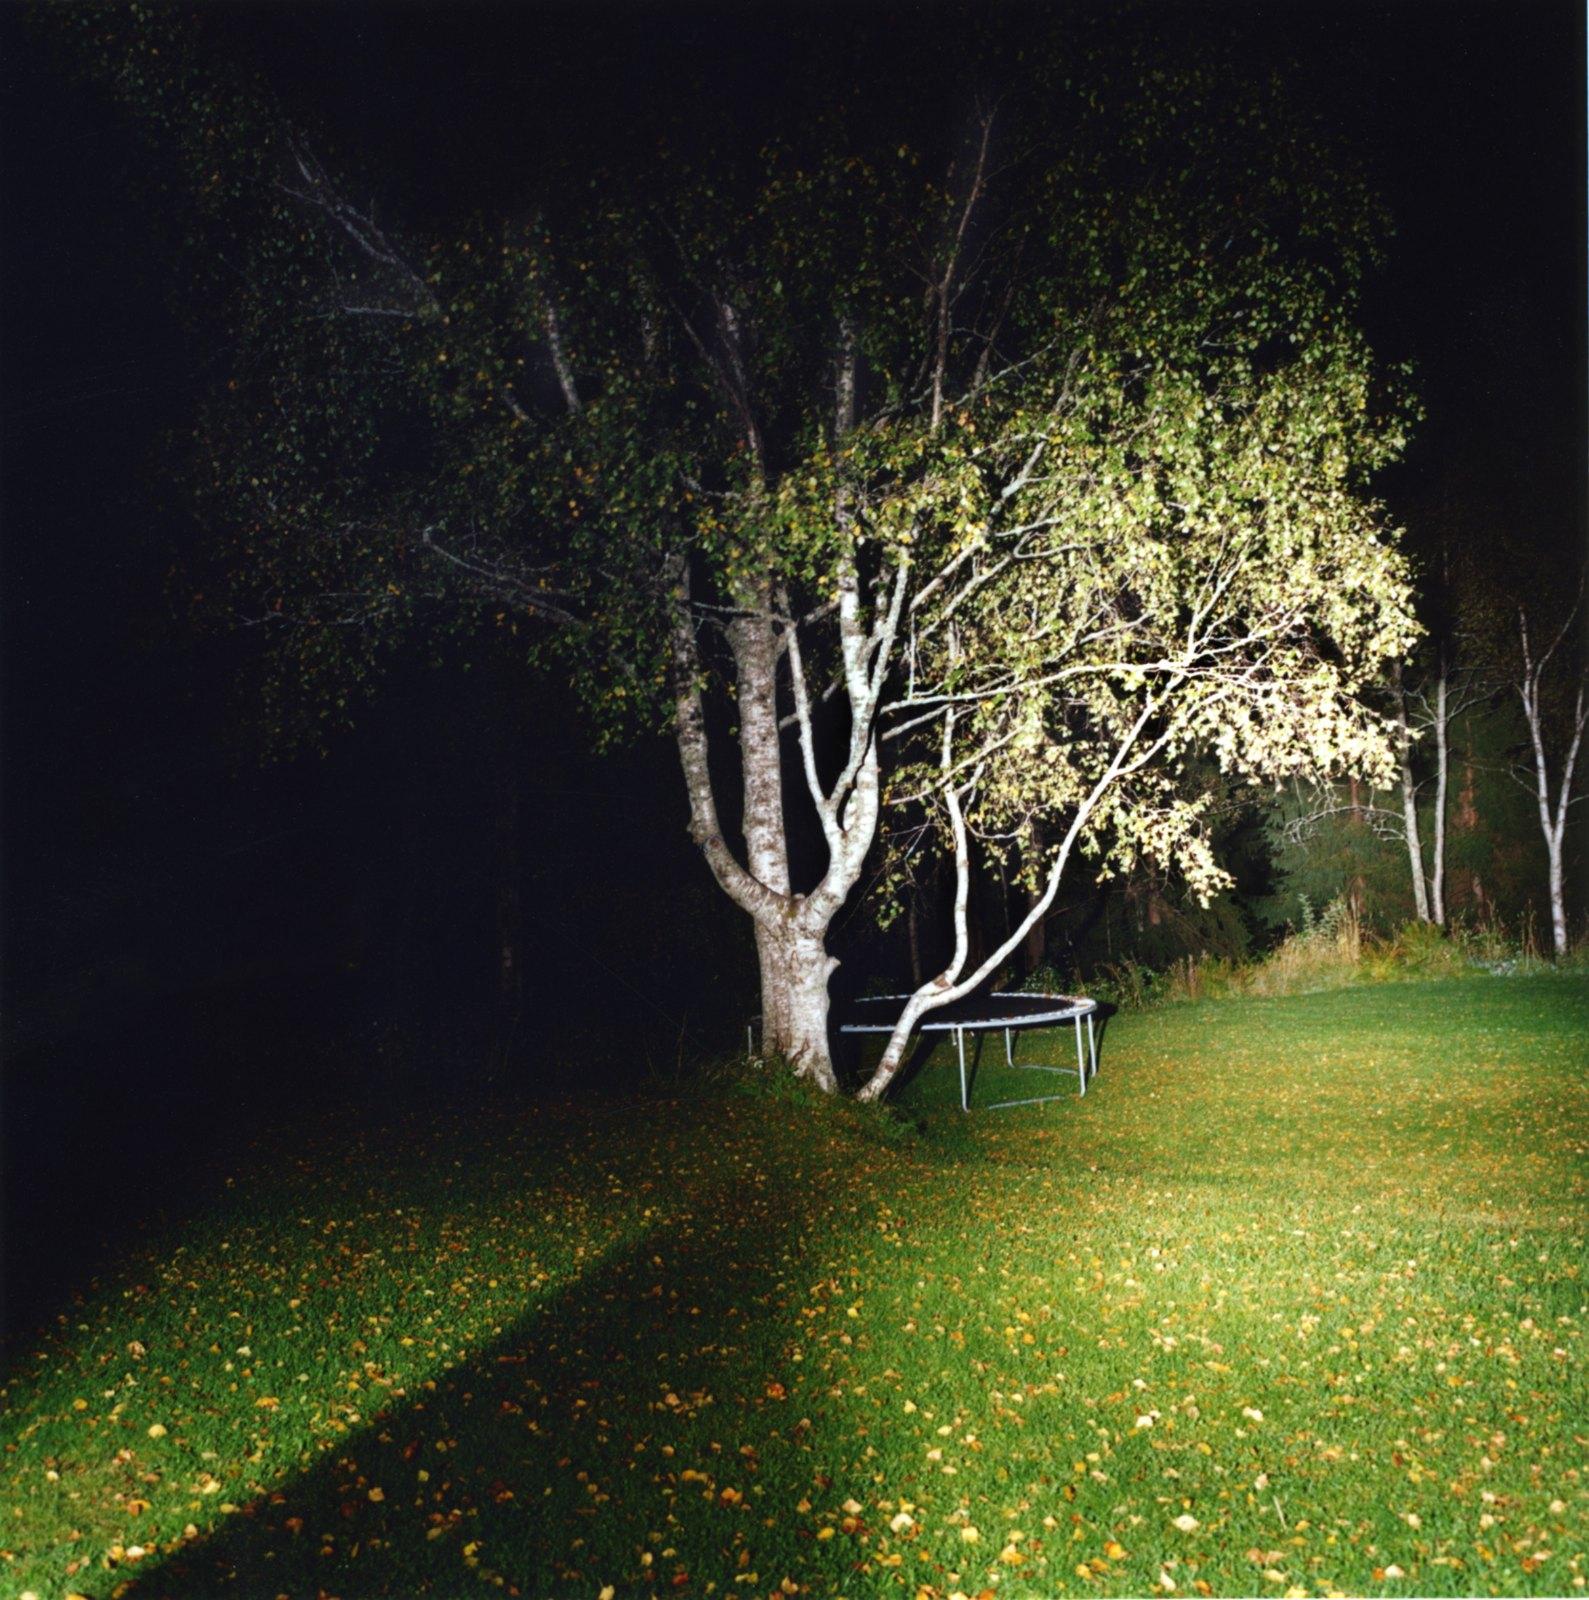 Dark jump, 2011, C-print, 100 x 100 cm